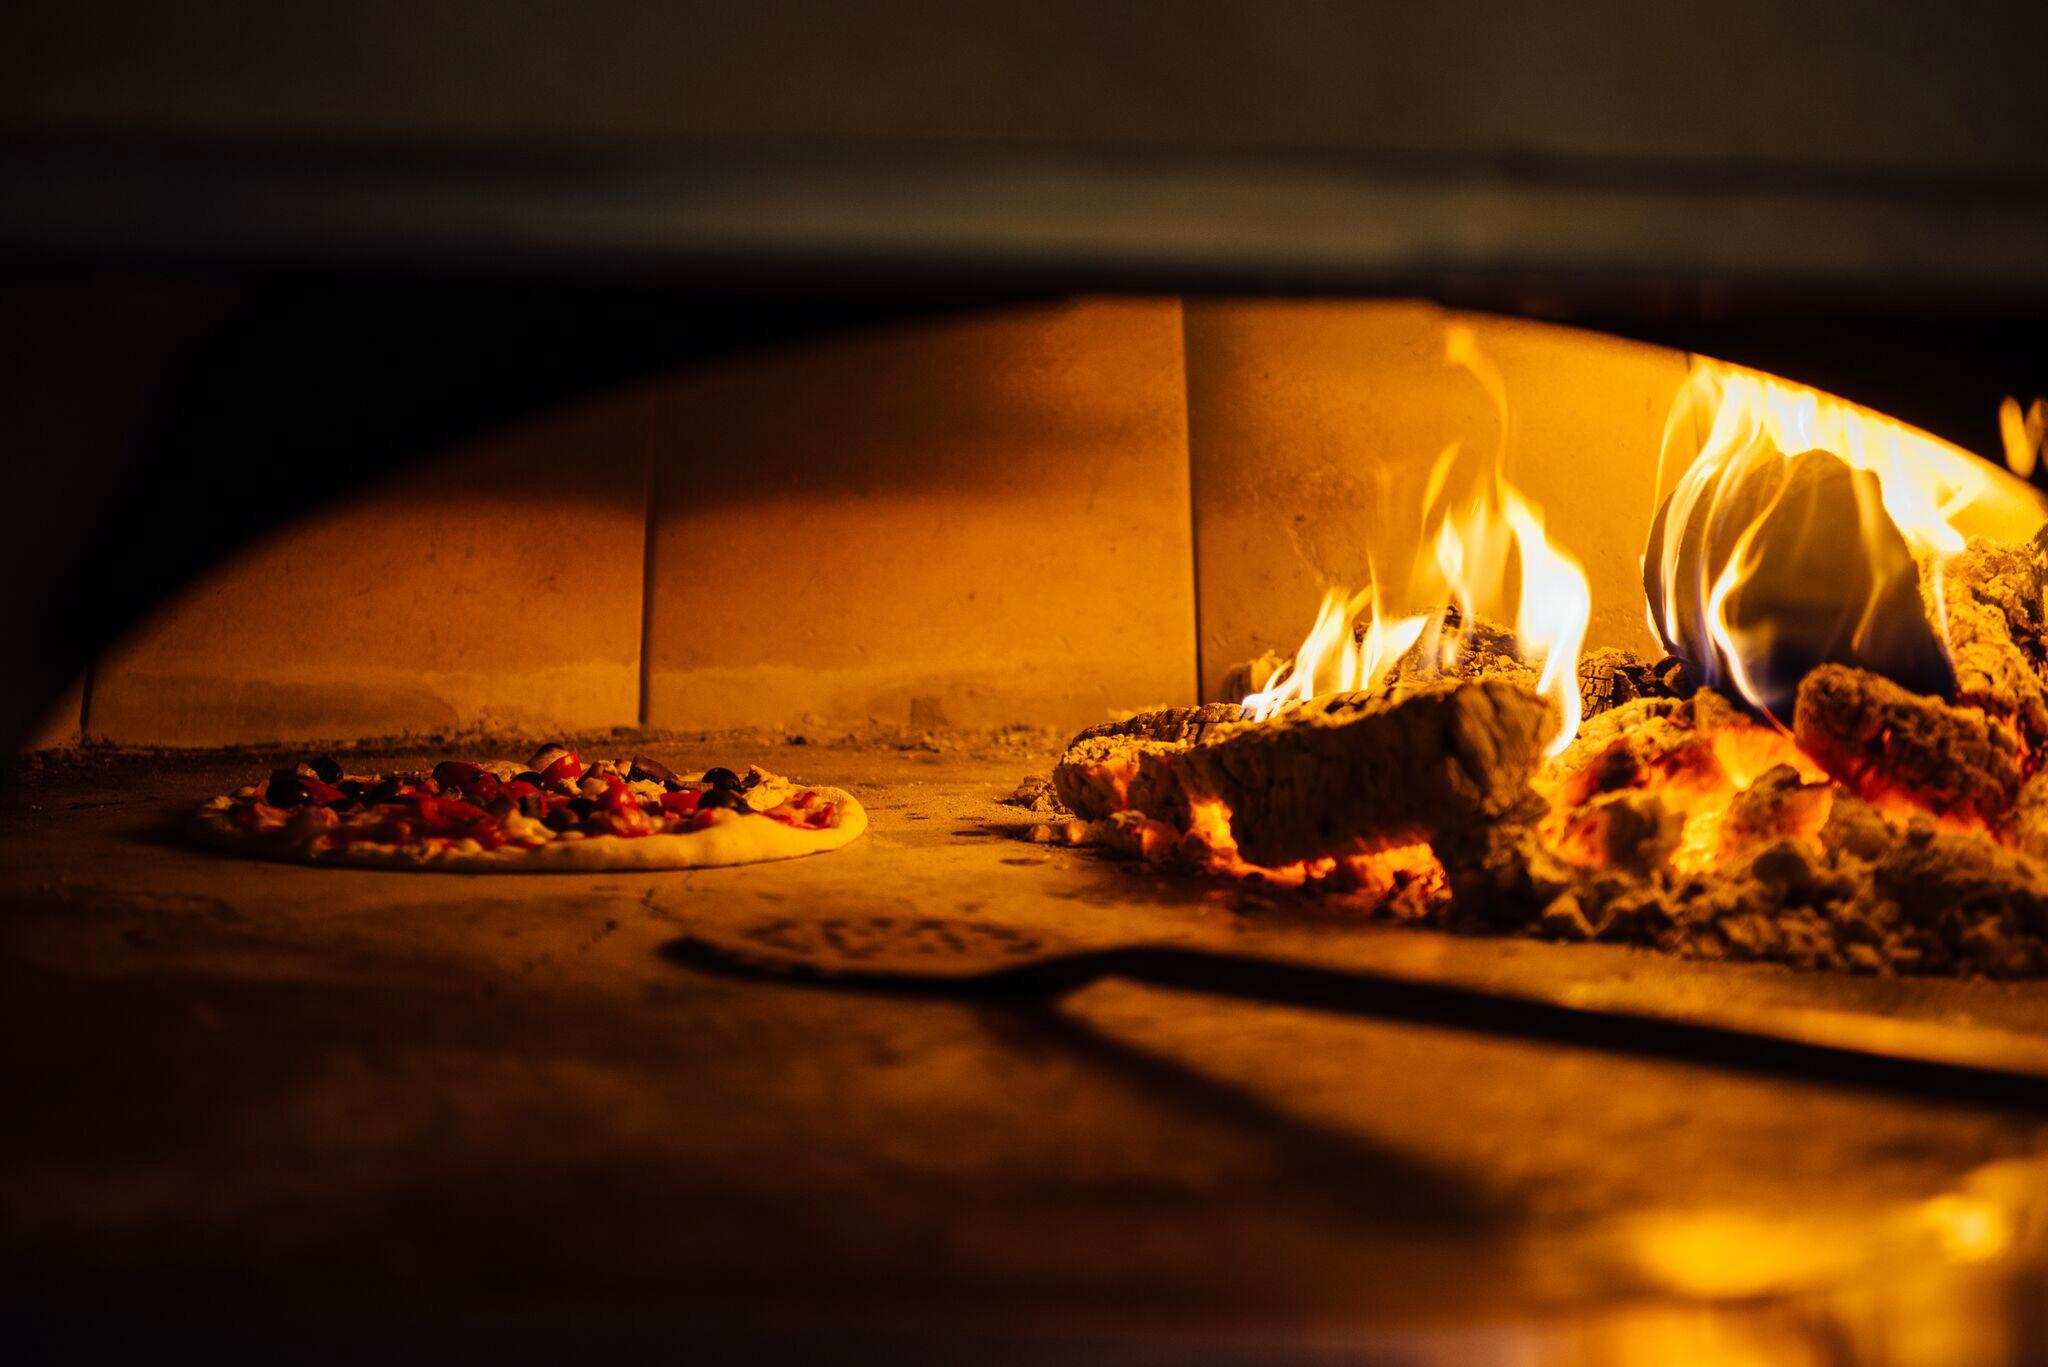 Blue Boar Kitchen Pizza Oven w: Chef 3.jpg